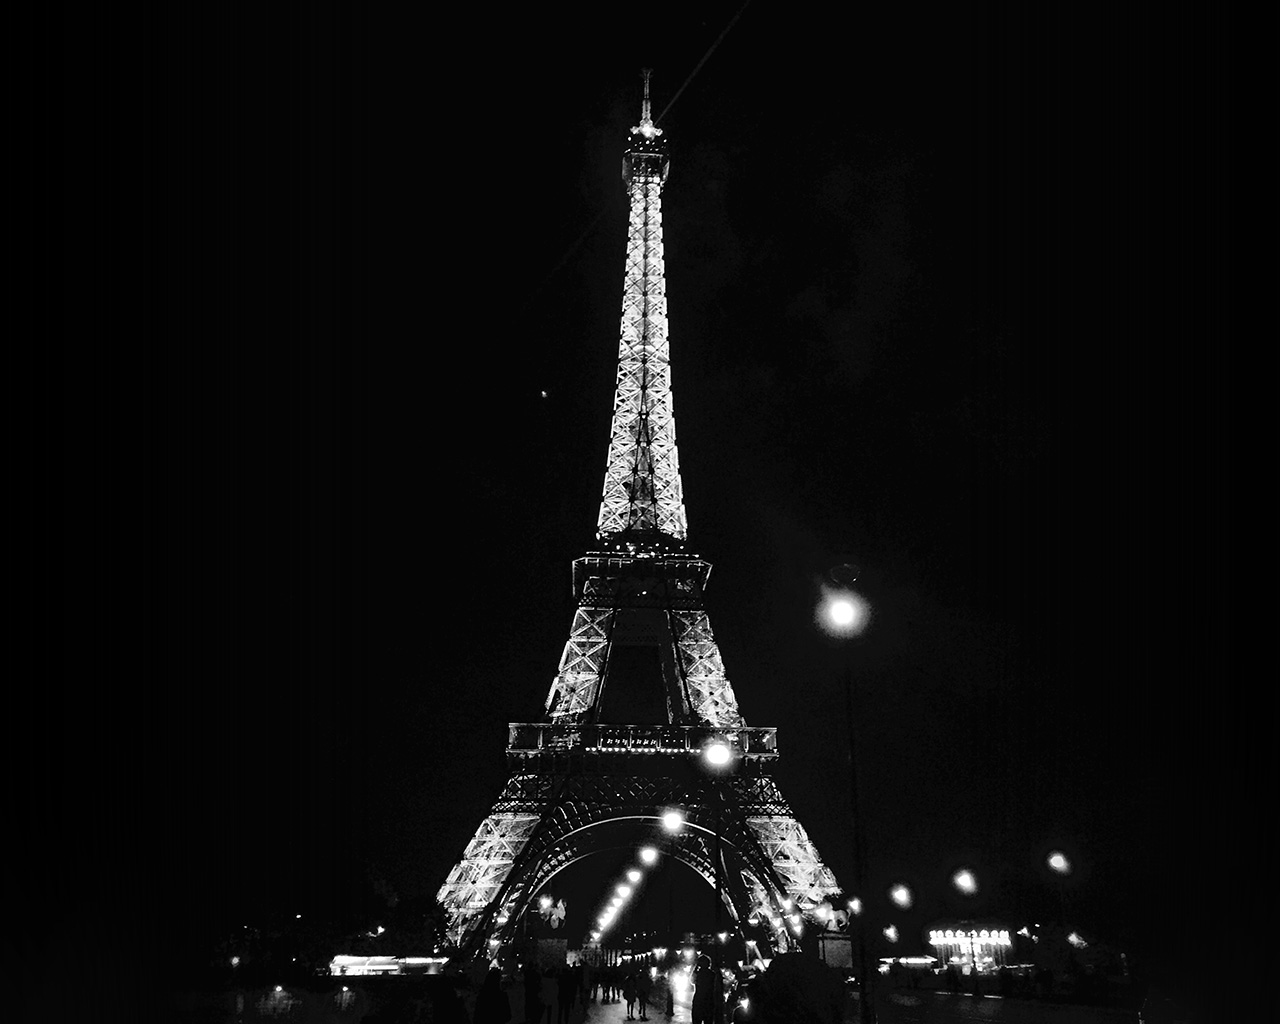 Laptop Wallpapers Fall Nd29 Paris City Art Night France Eiffel Tower Dark Bw